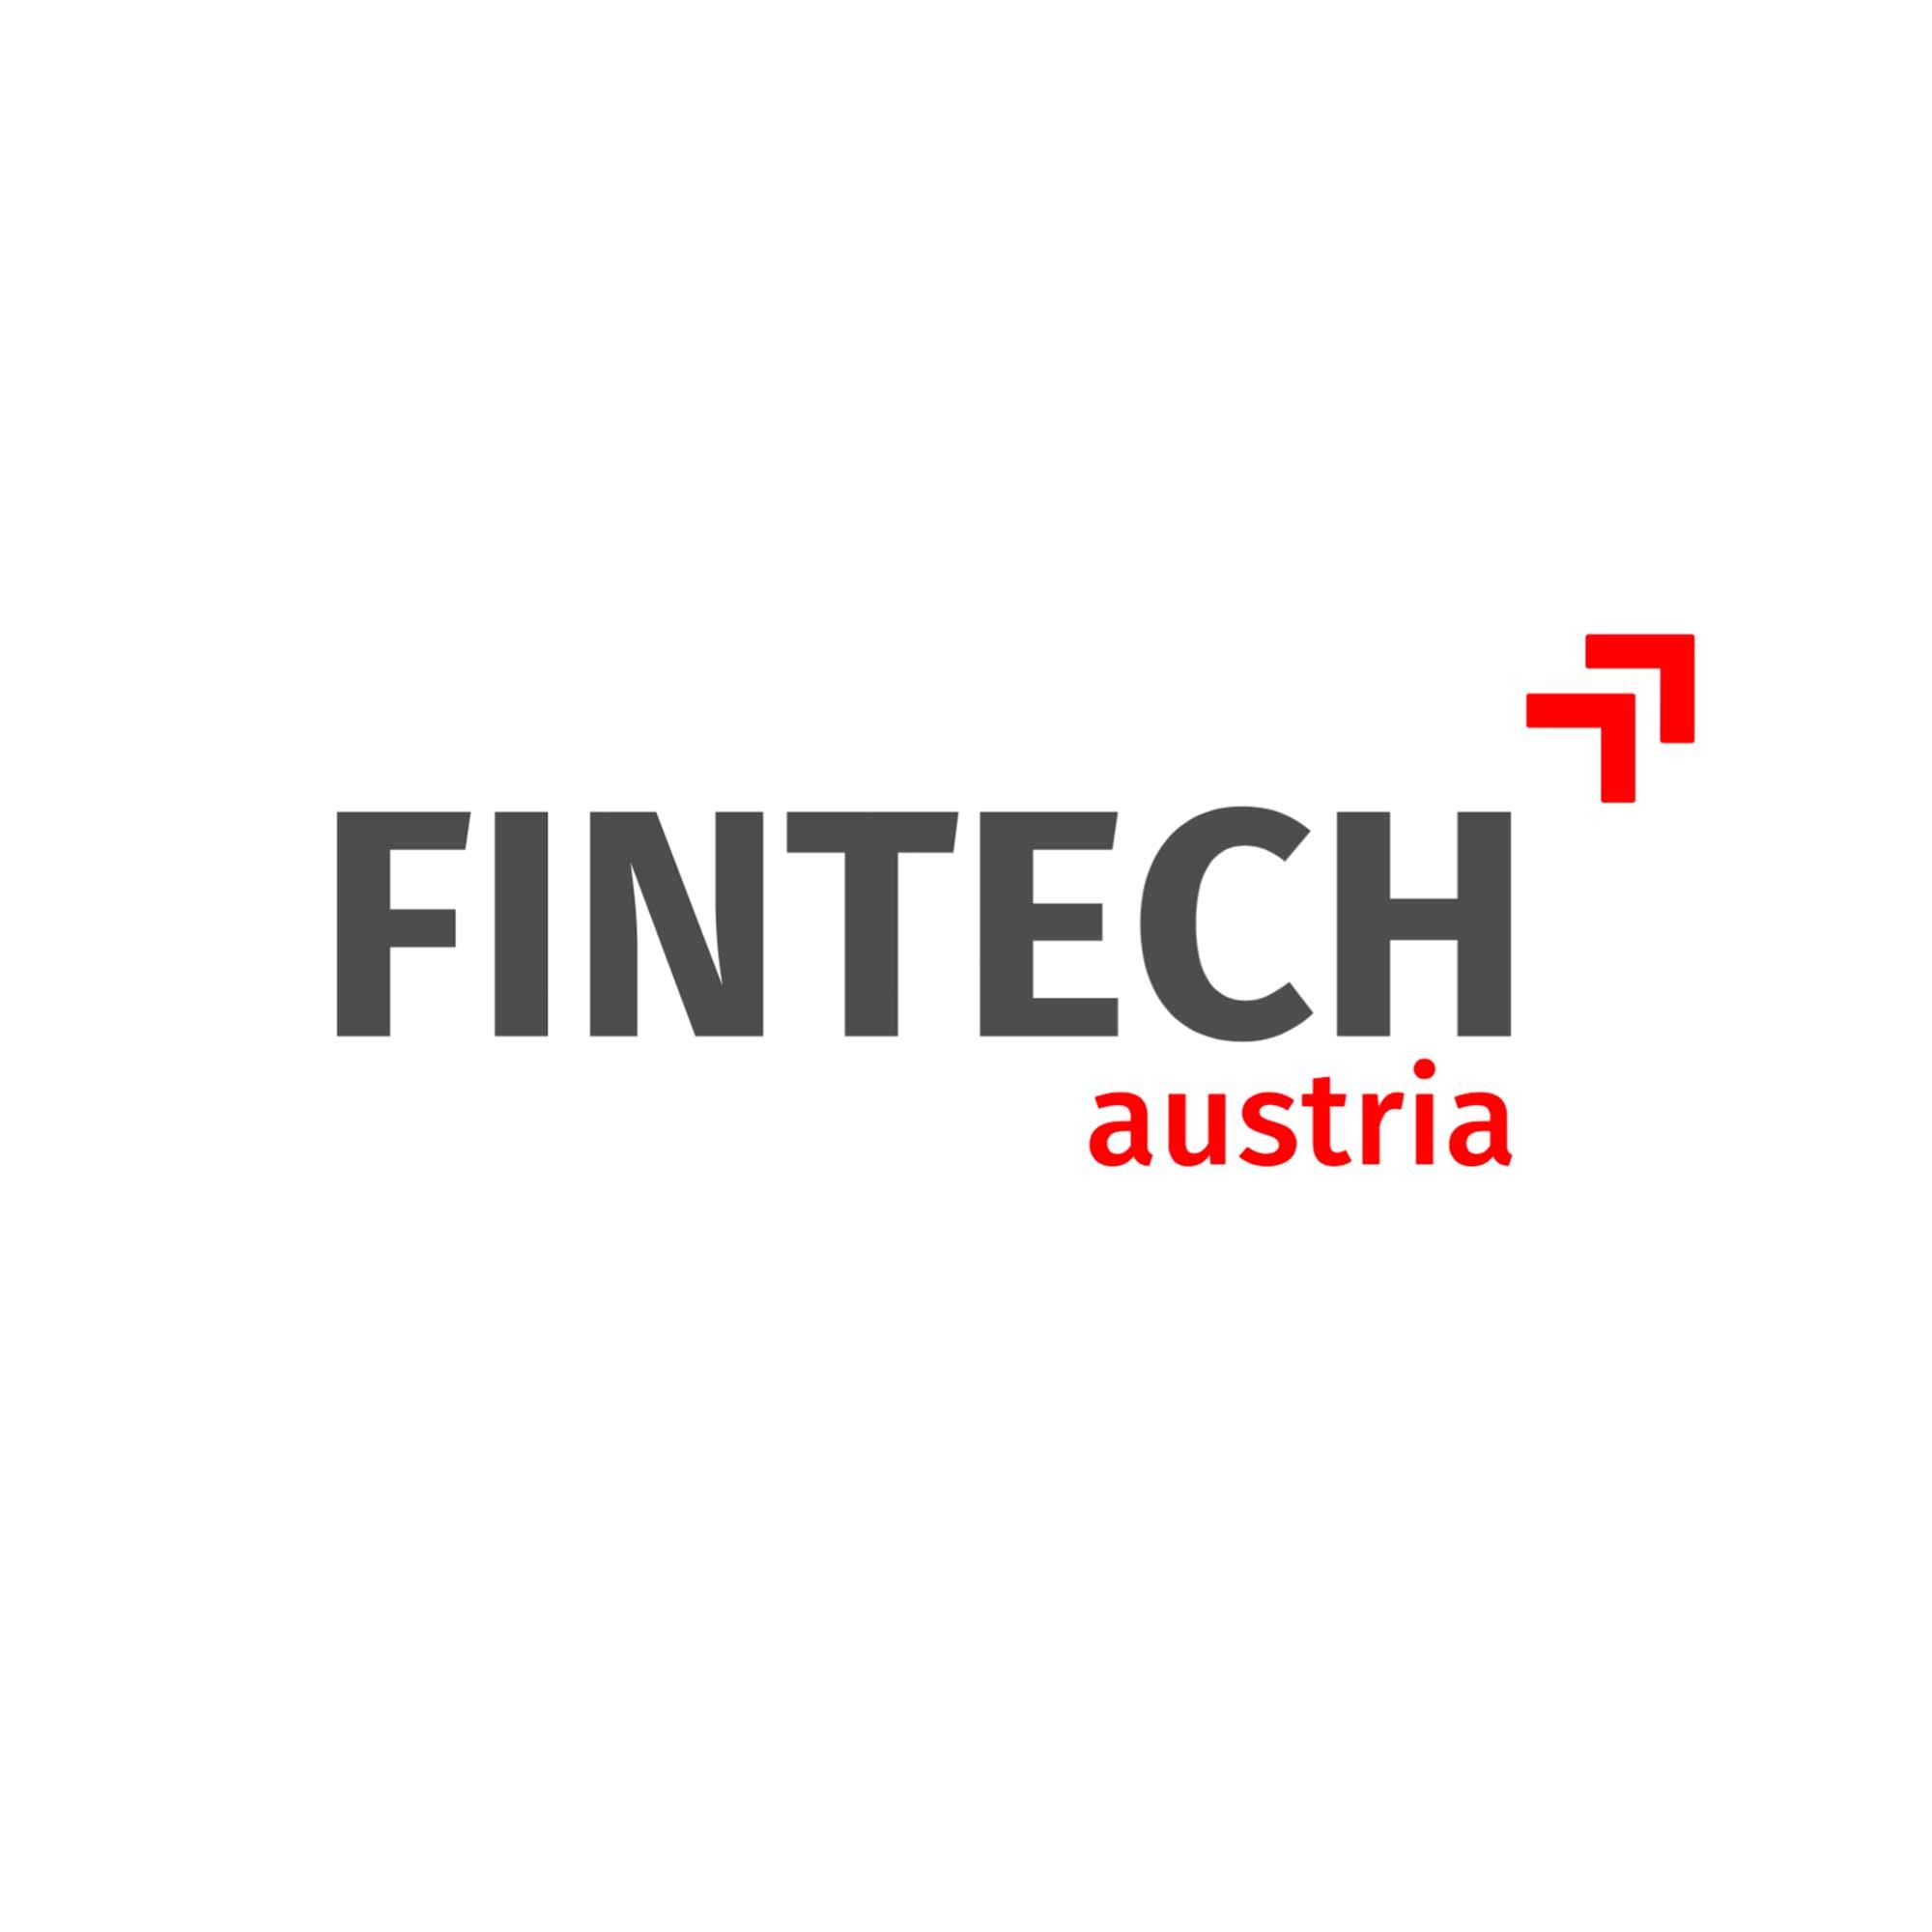 Fintech Austria Logo